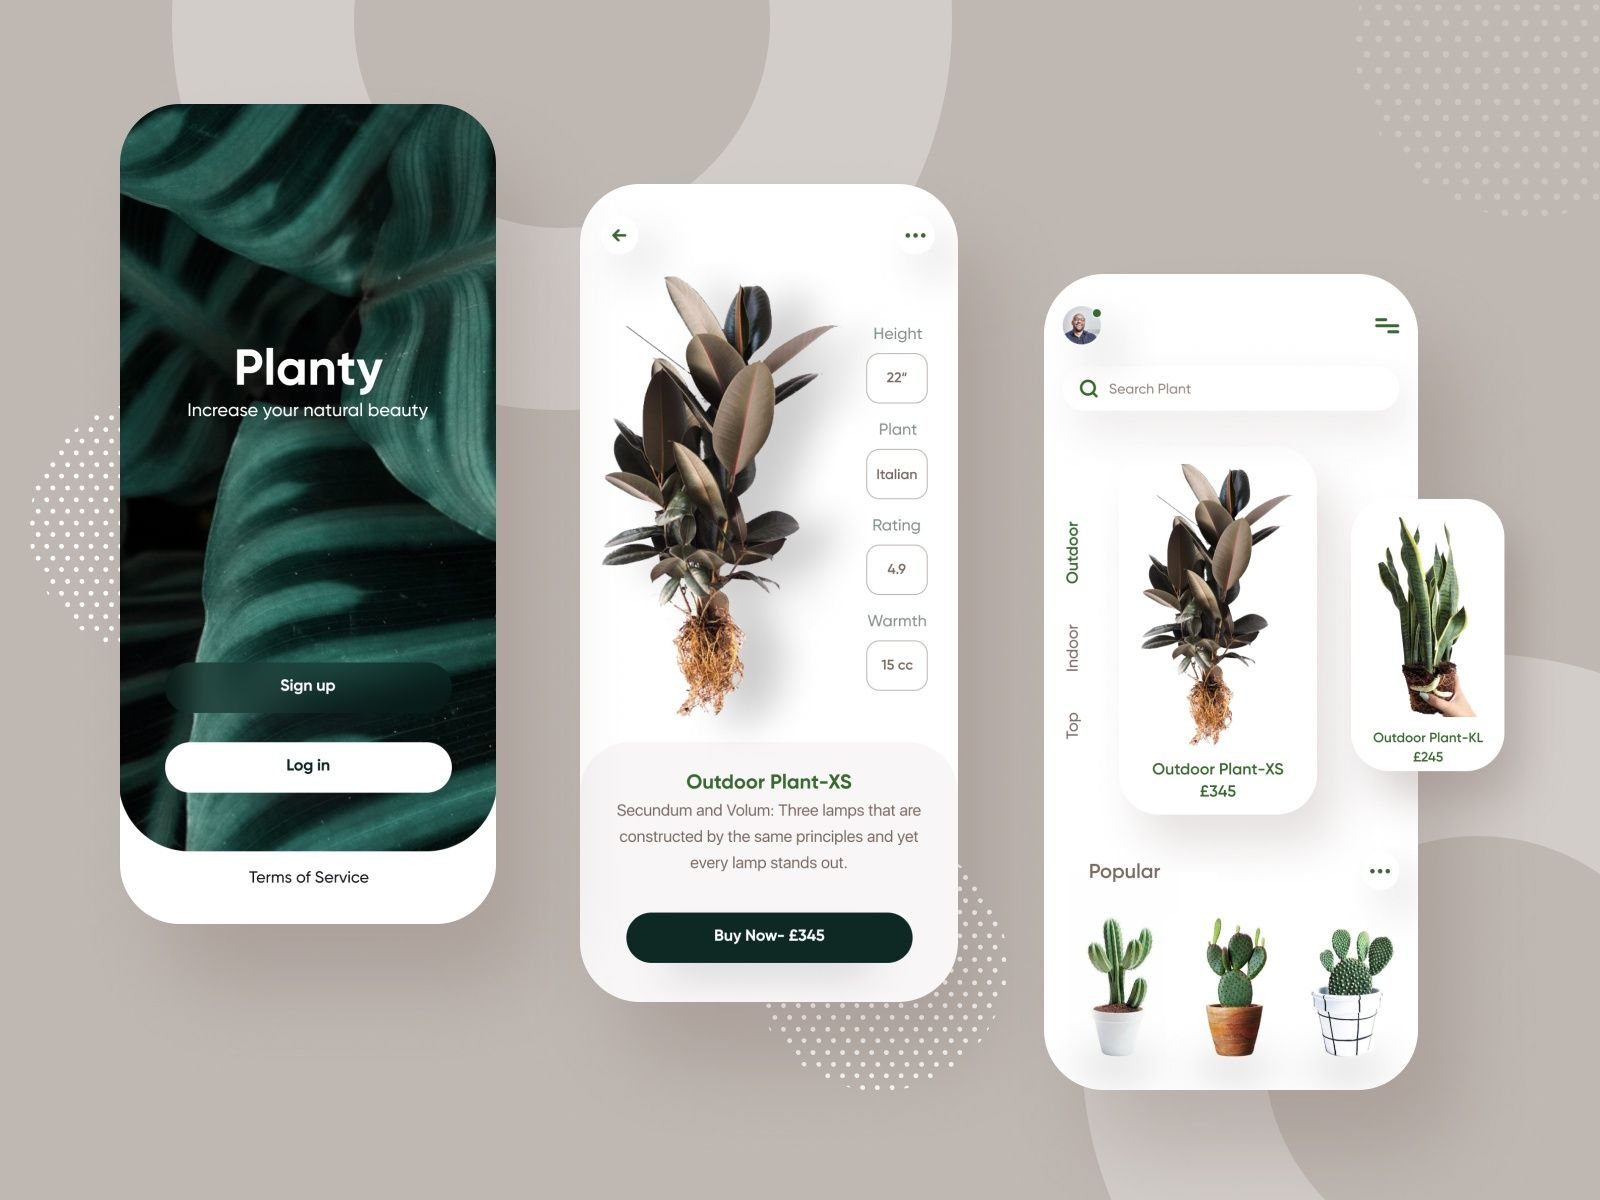 Plant Shop App Design App Interface Design Mobile App Design Inspiration